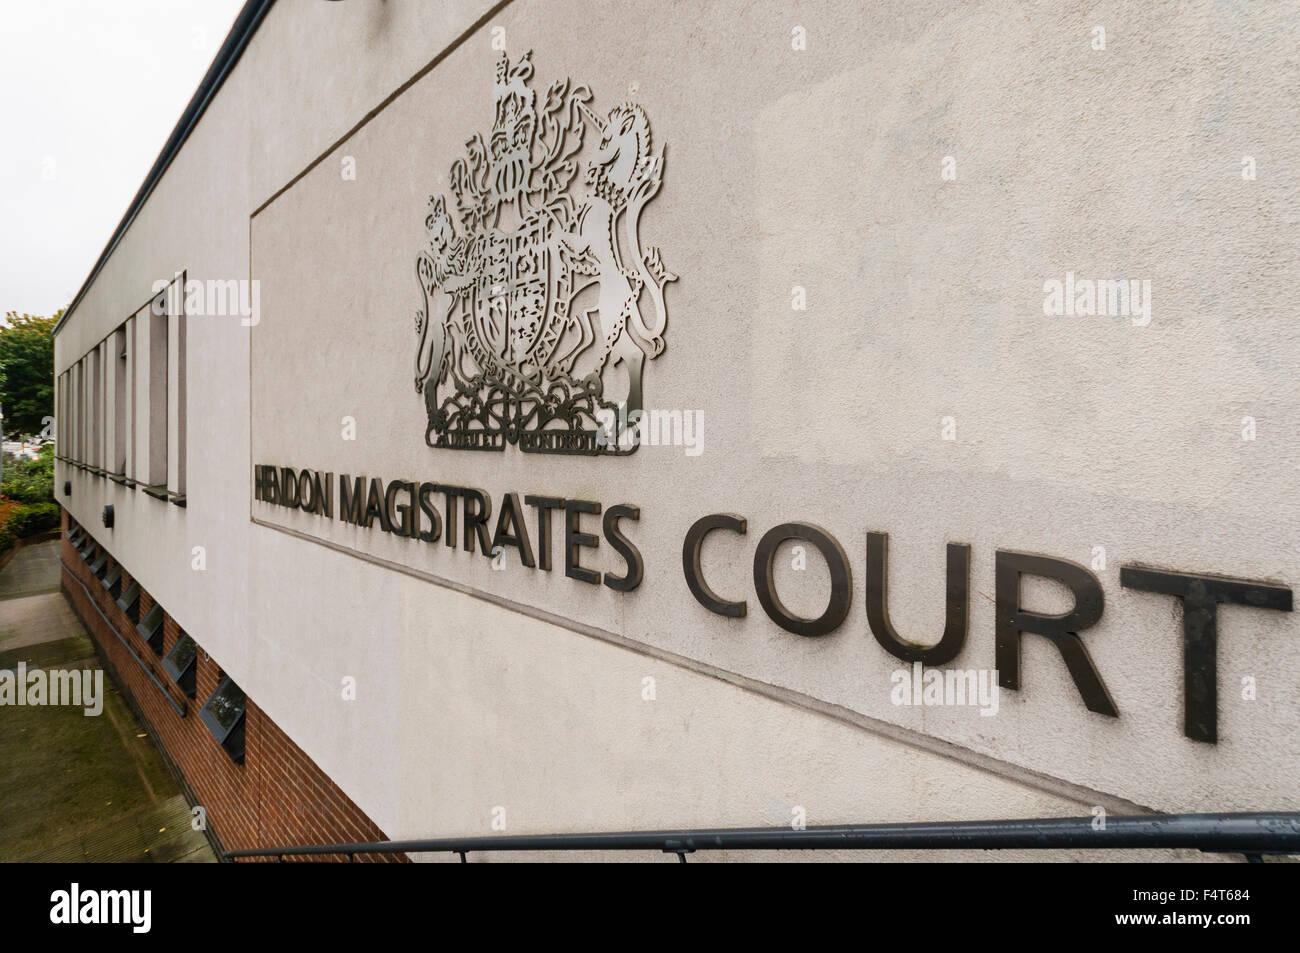 Hendon Magistrates Court, London NW9 - Stock Image